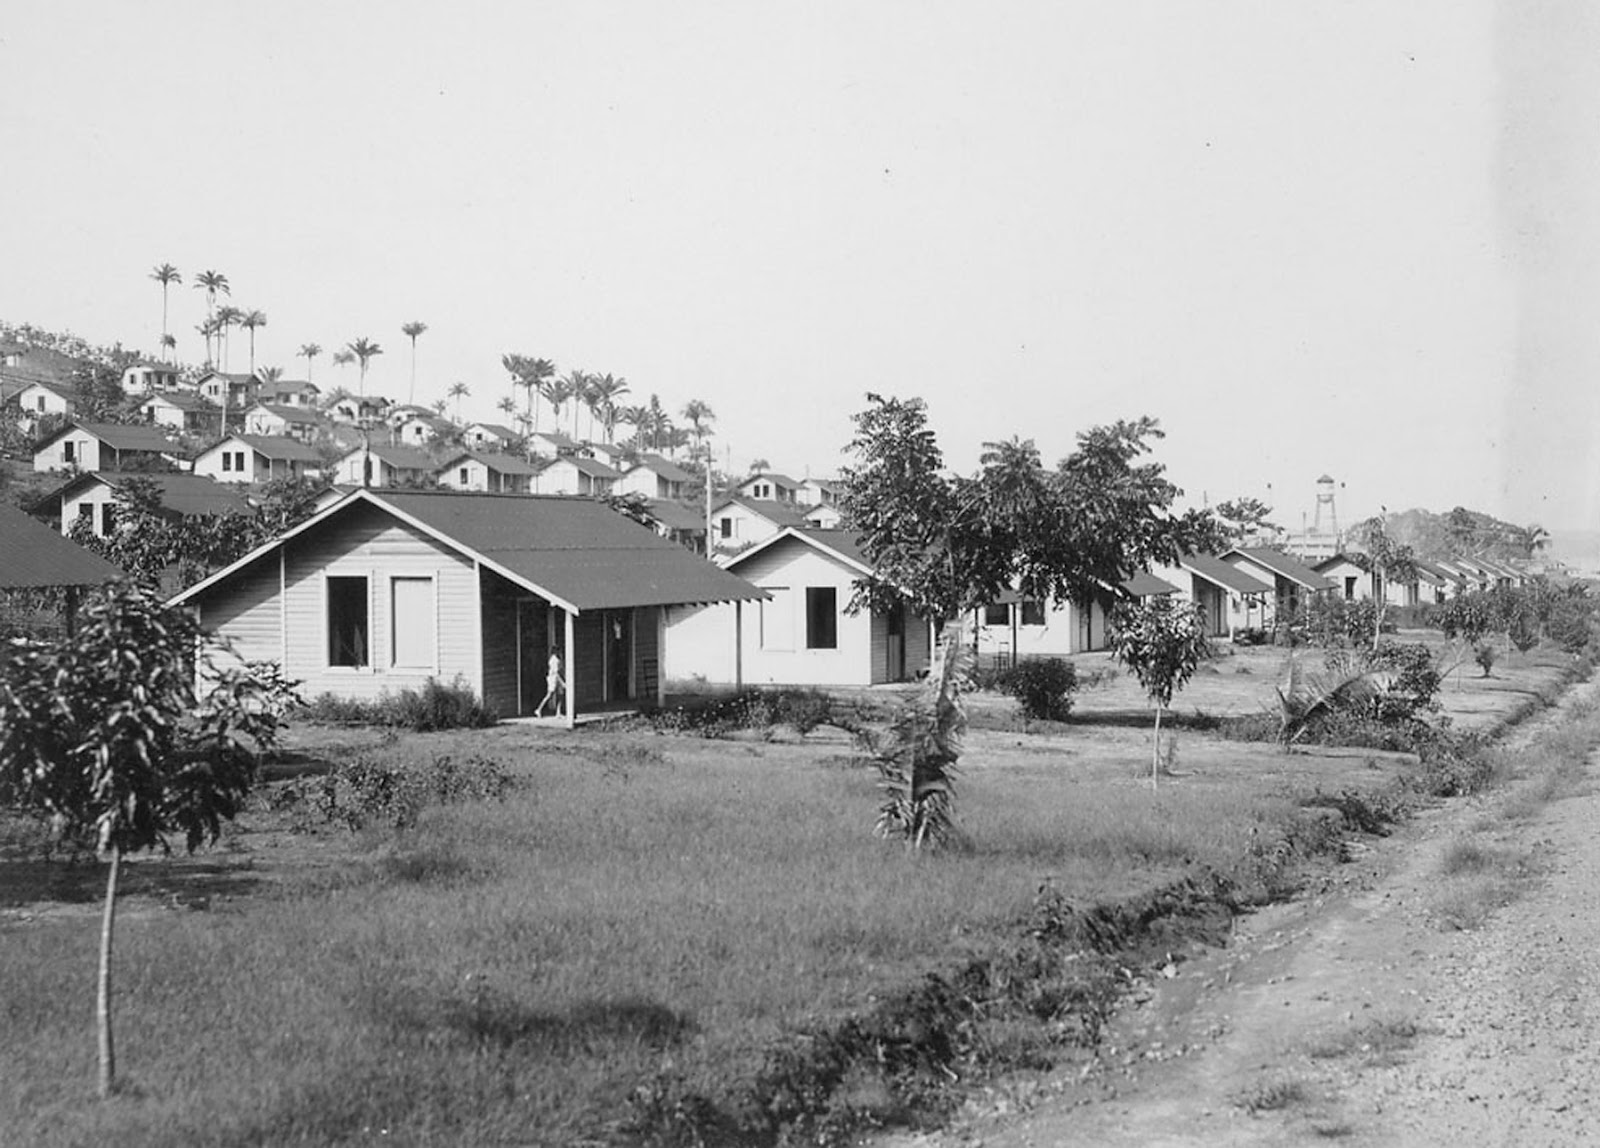 Fordlandia , Brazil, 1927